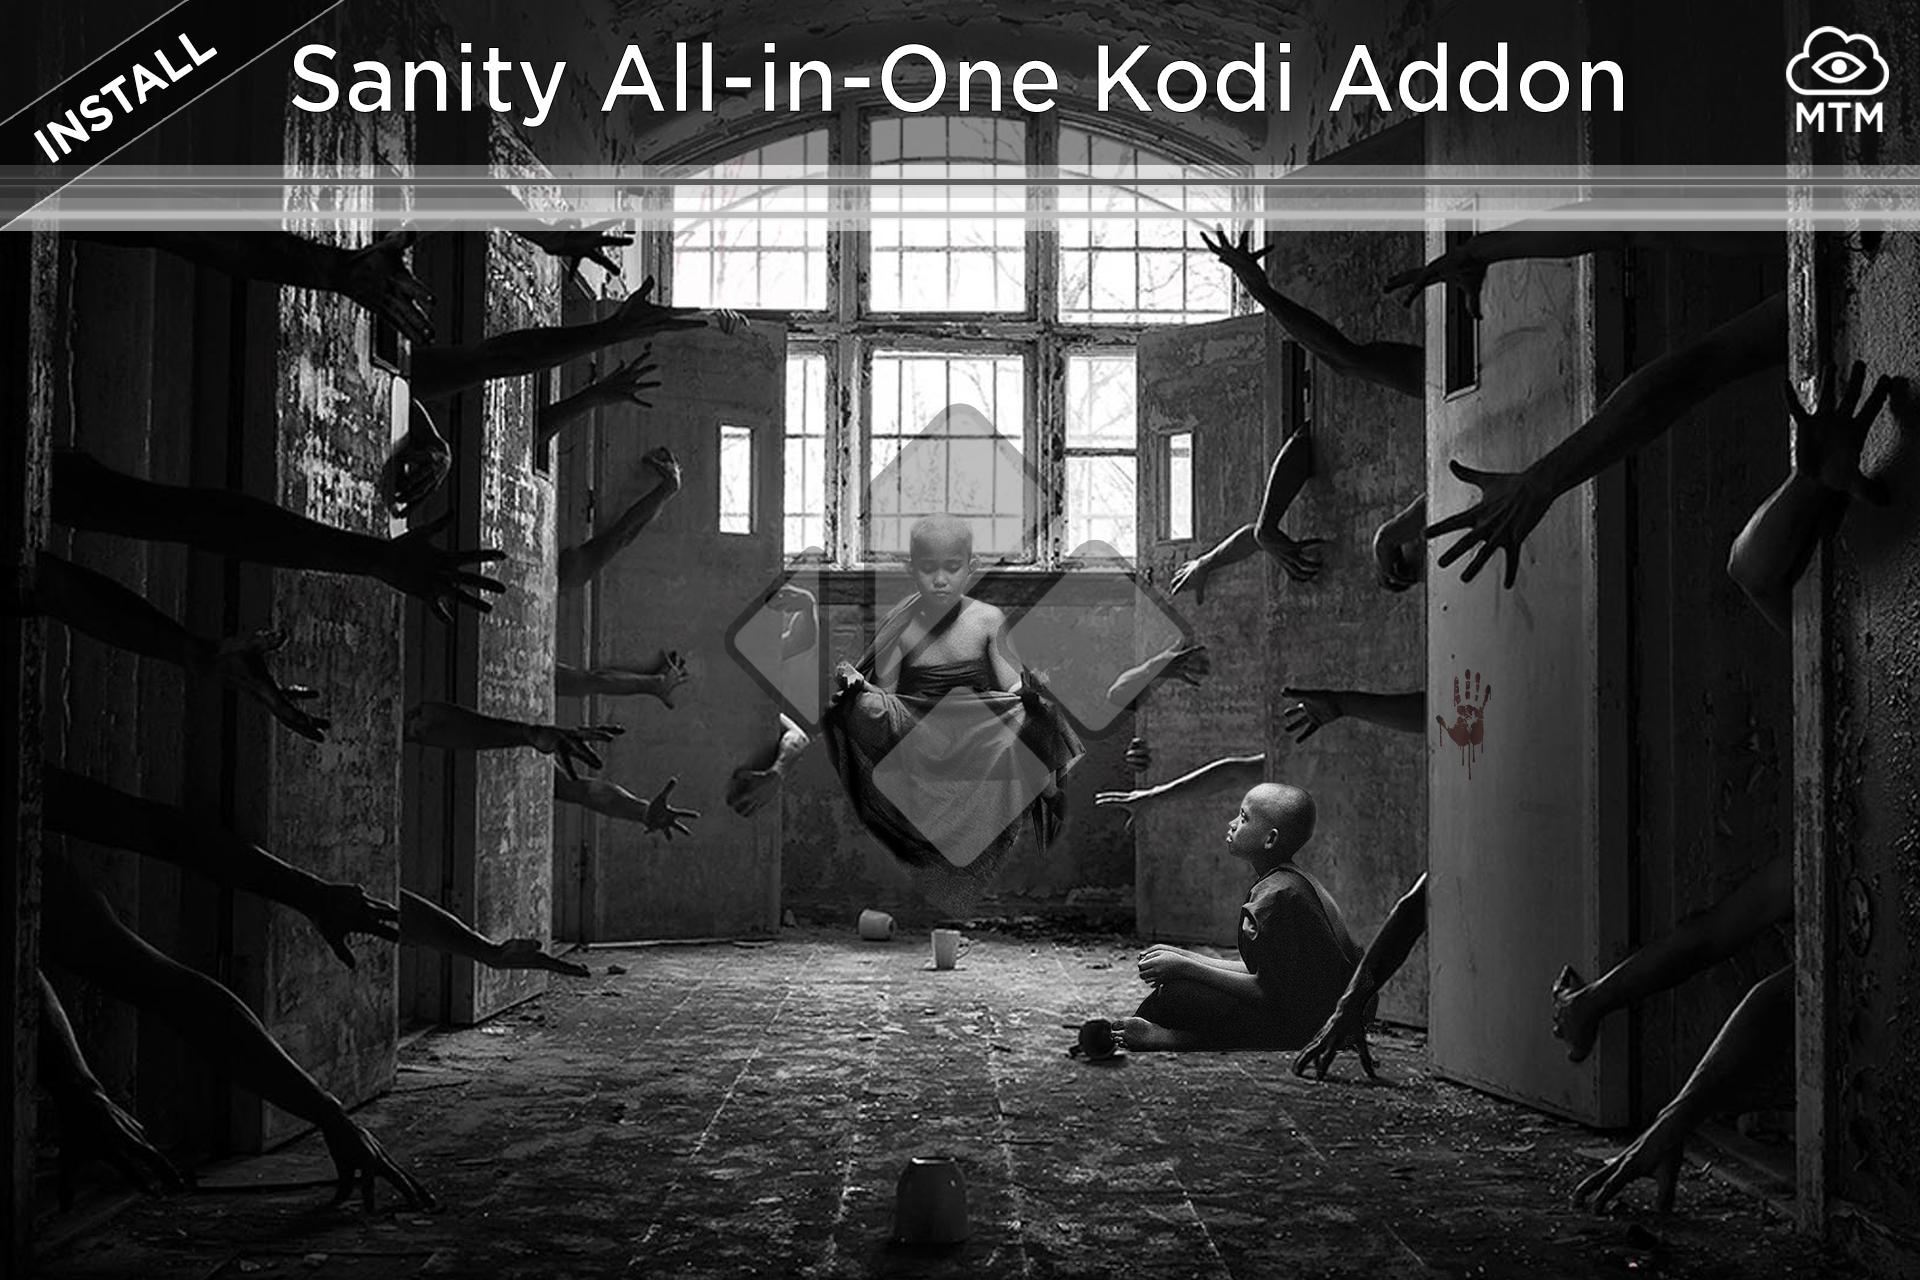 How to Install Sanity Kodi Video Addon of Sandman Repository